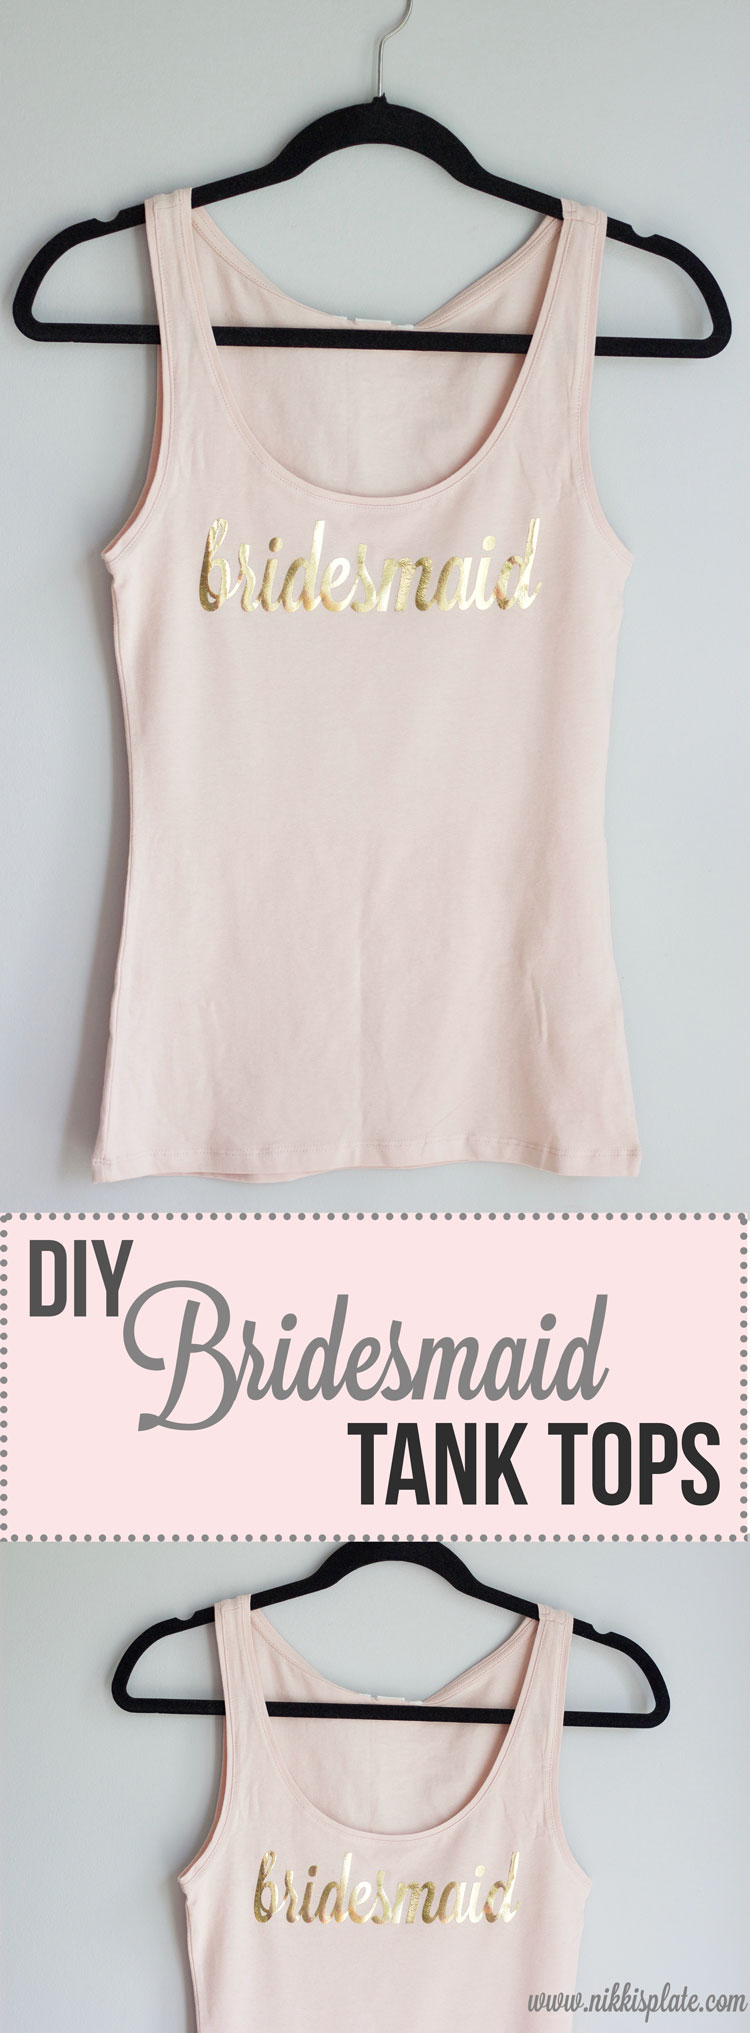 DIY bridesmaid tank top shirts blush and gold || Bridesmaids proposal || www.nikkisplate.com